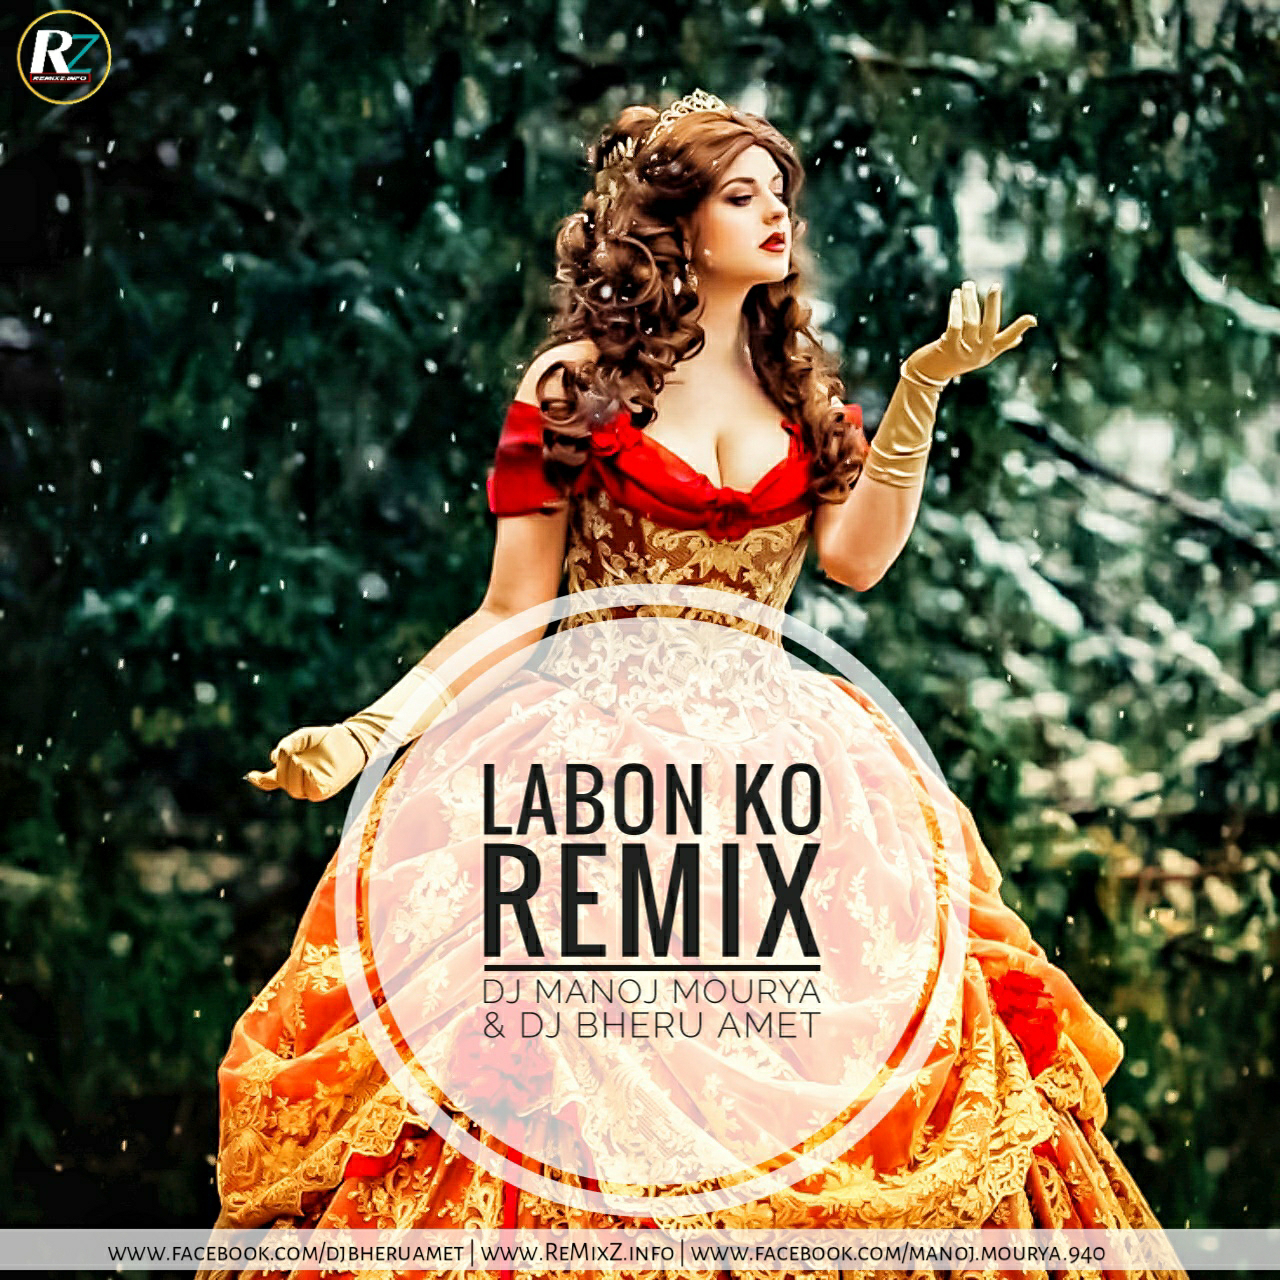 Labon_Ko_Remix-DJ_Manoj_Mourya_x_DJ_Bheru_Amet.jpg